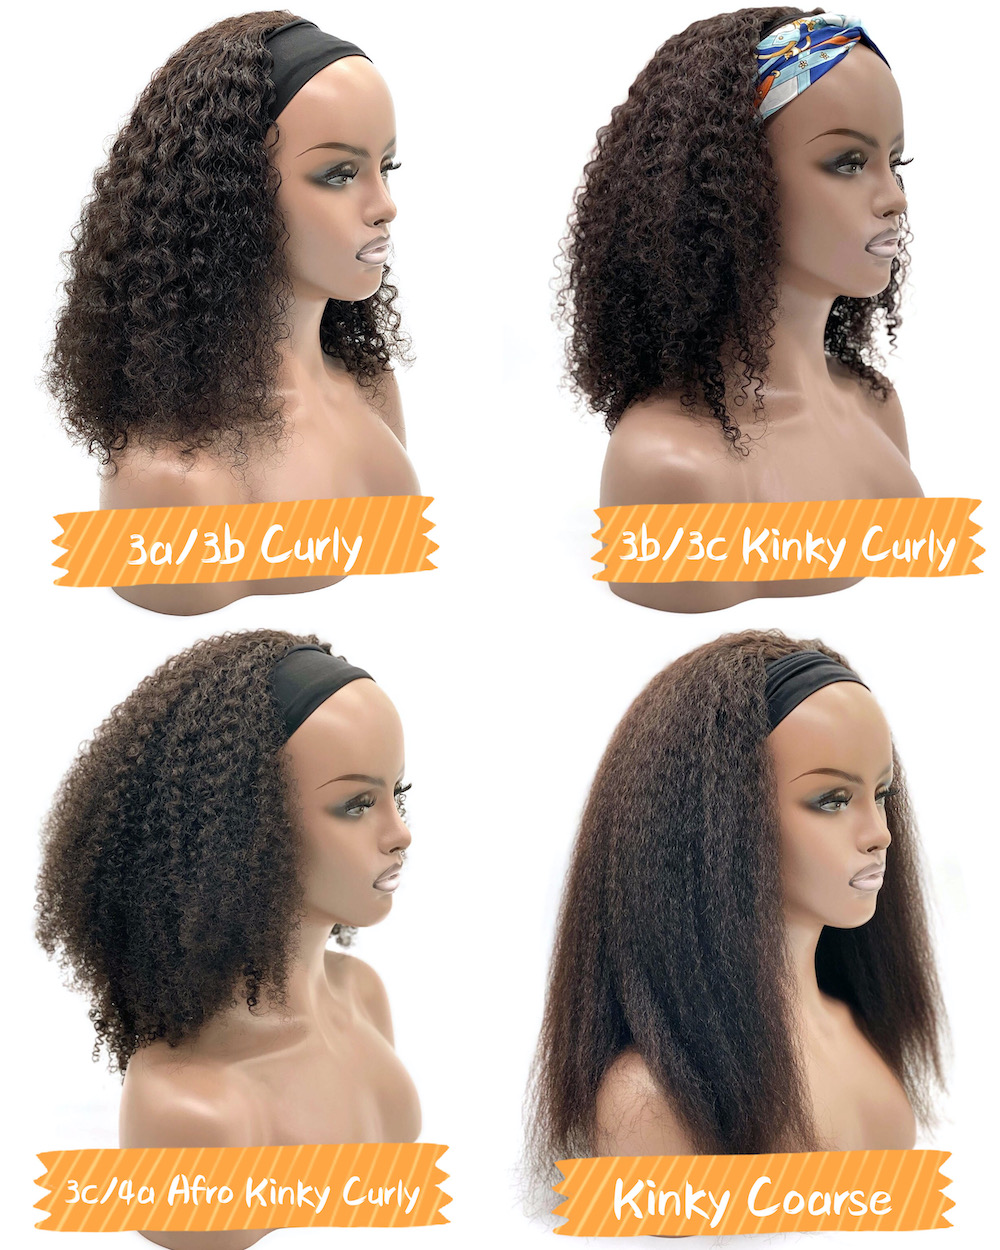 032f6b2a 0f18 41ac a14d 90adf8e4e36c - Introducing – Best Natural Textured Headband Wigs